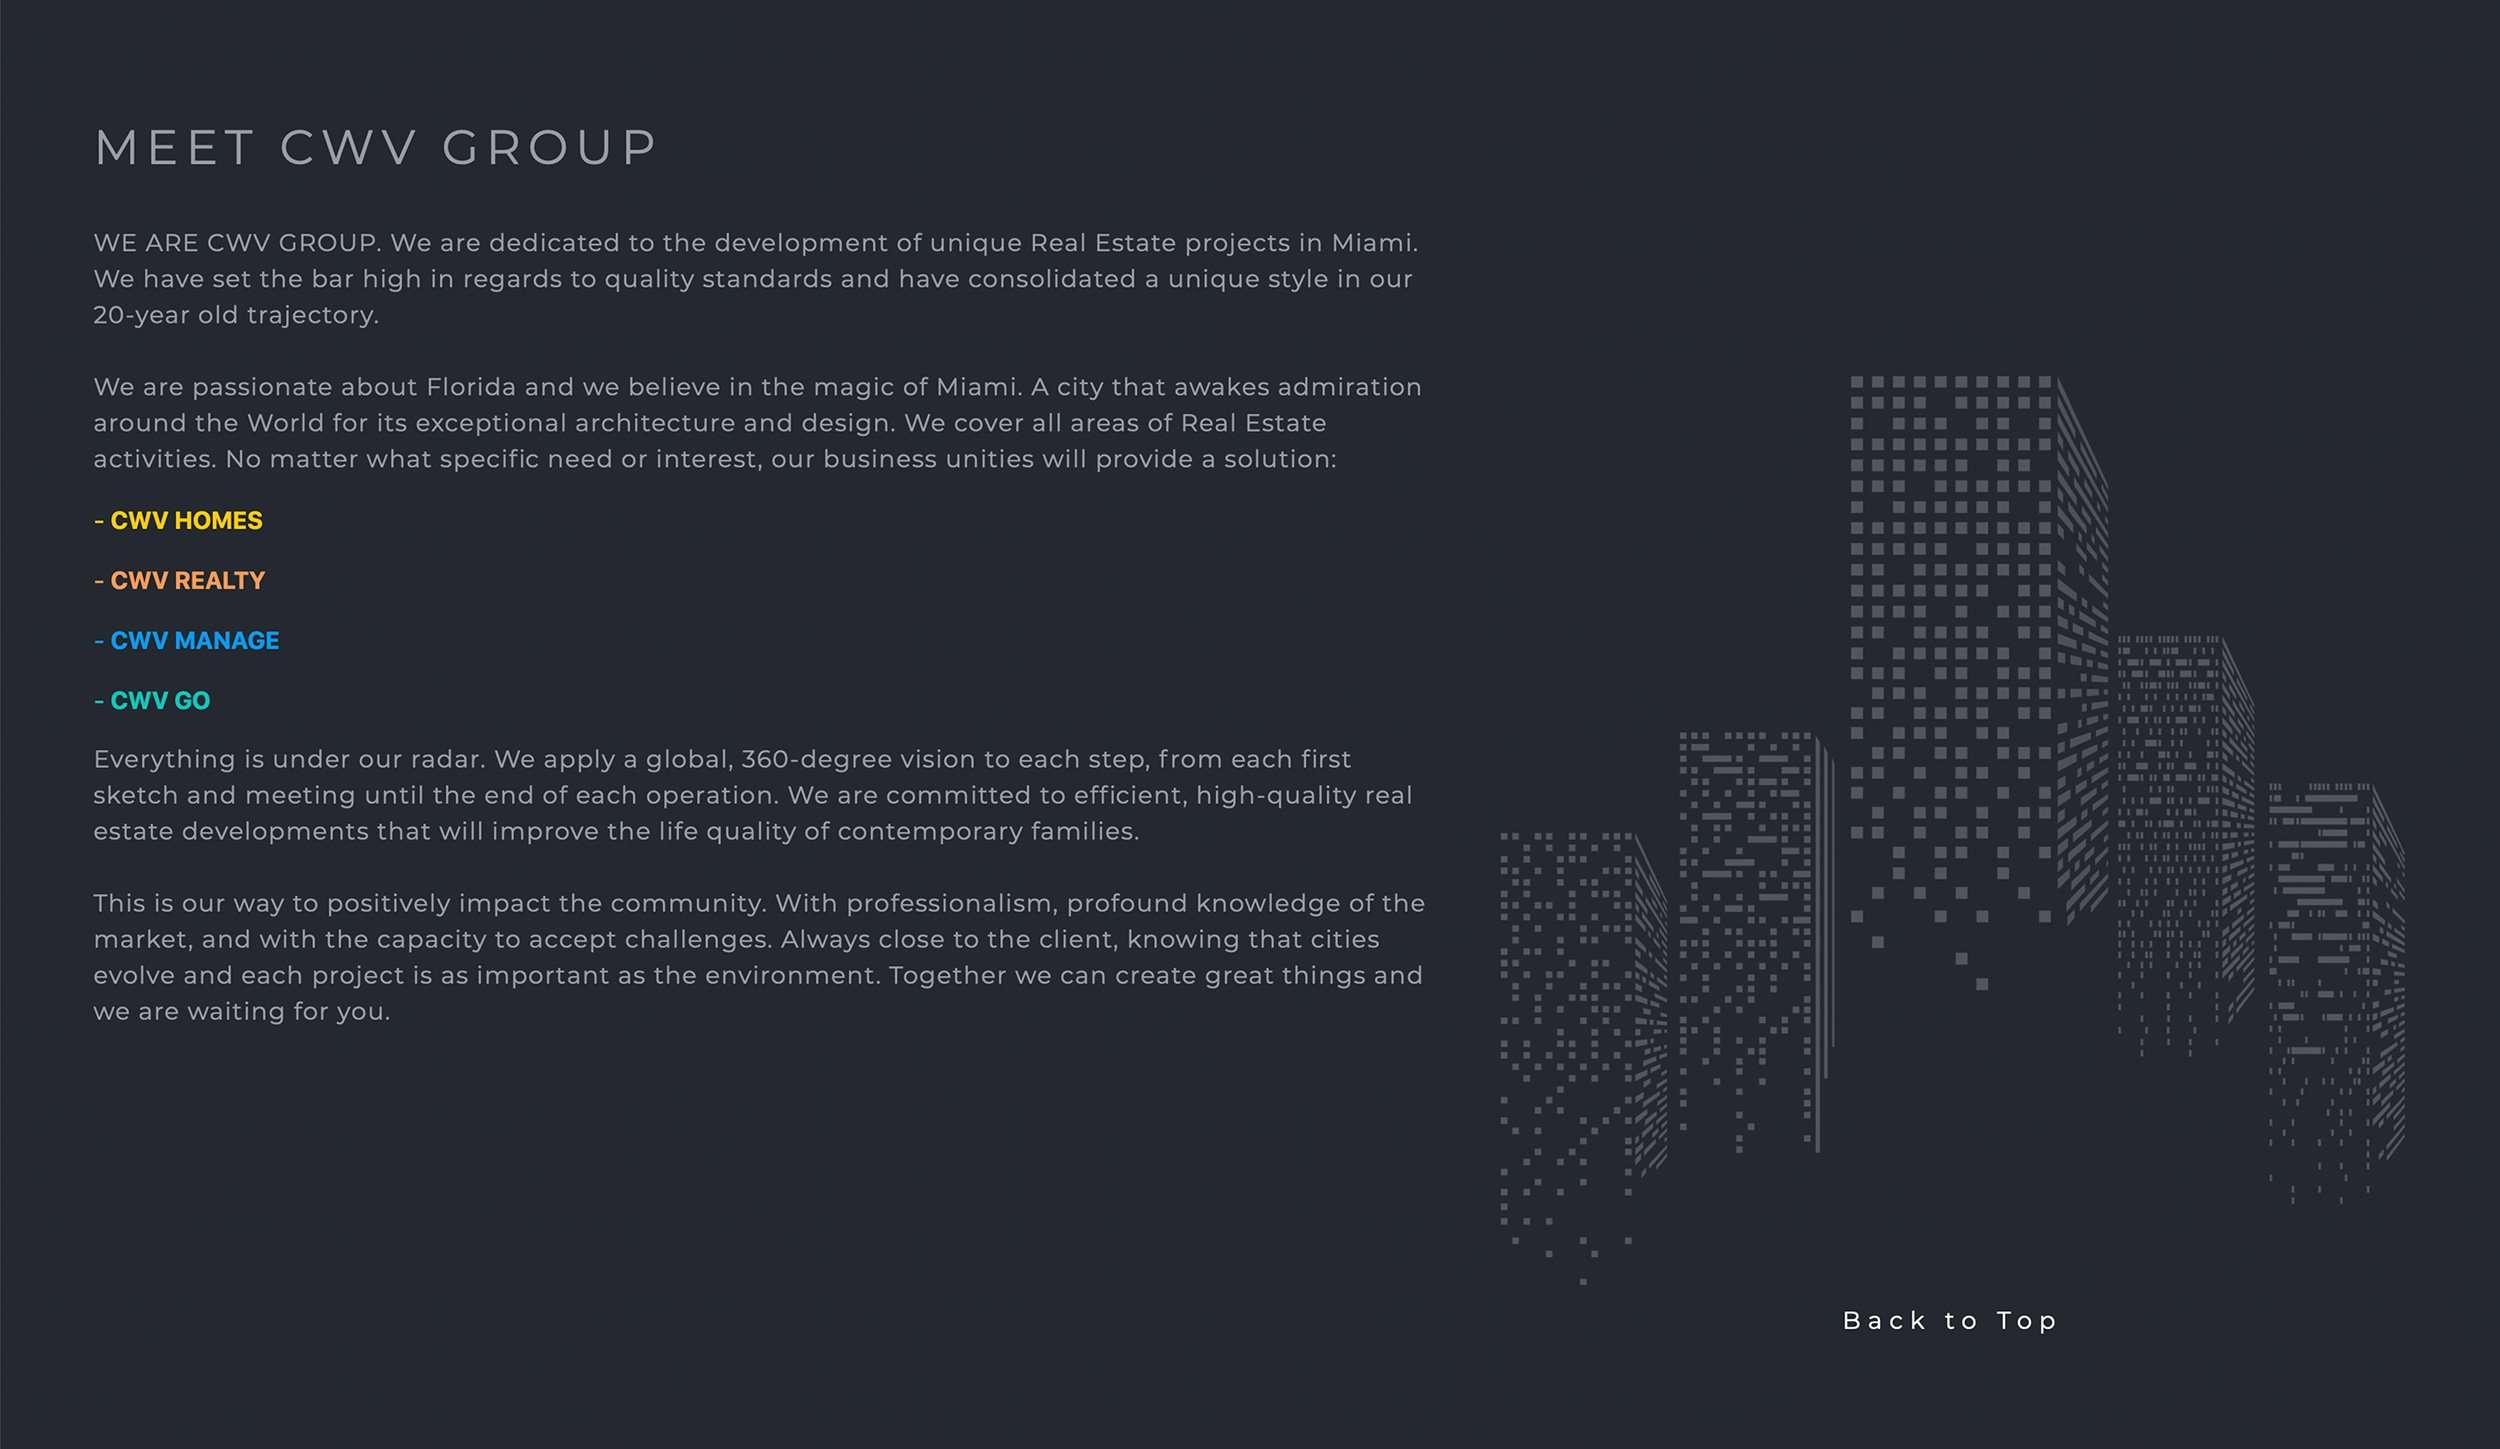 cwv-group-miami-usa-estados-unidos-real-estate-online-lab-lisbon-web-development-web-design-2